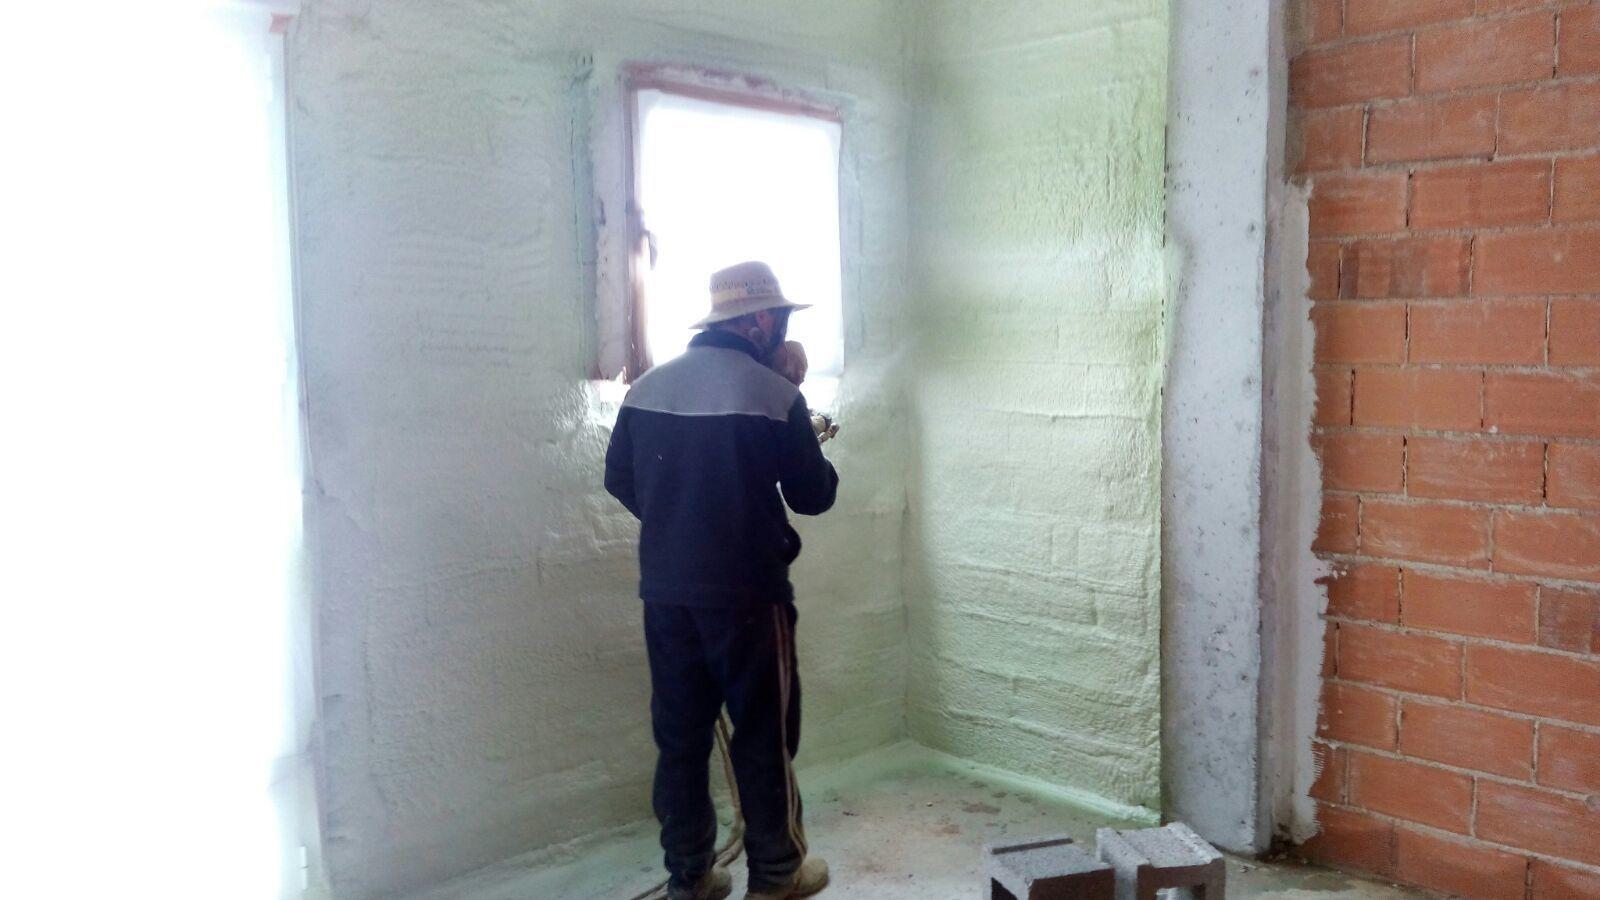 Foto 26 de Aislamientos acústicos y térmicos en Rafelcofer | Aislamientos de Poliuretano Jaime Femenia